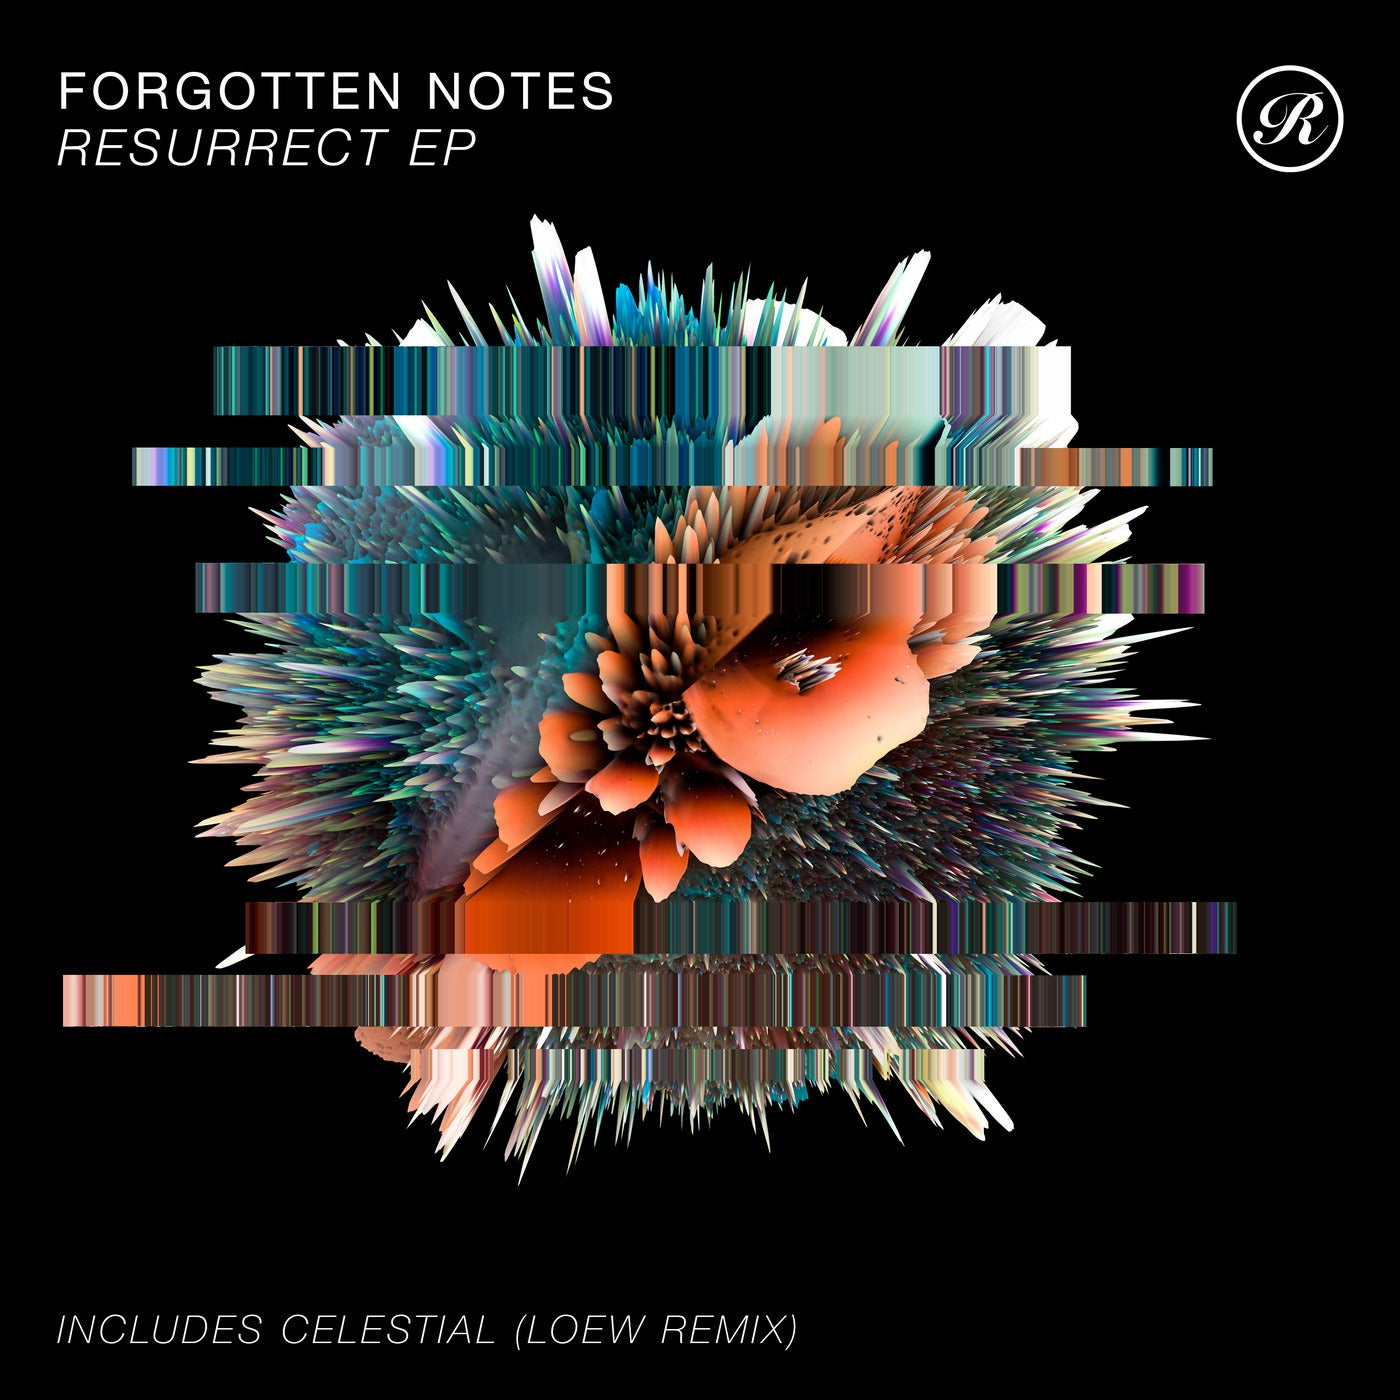 Celestial (Loew Remix)